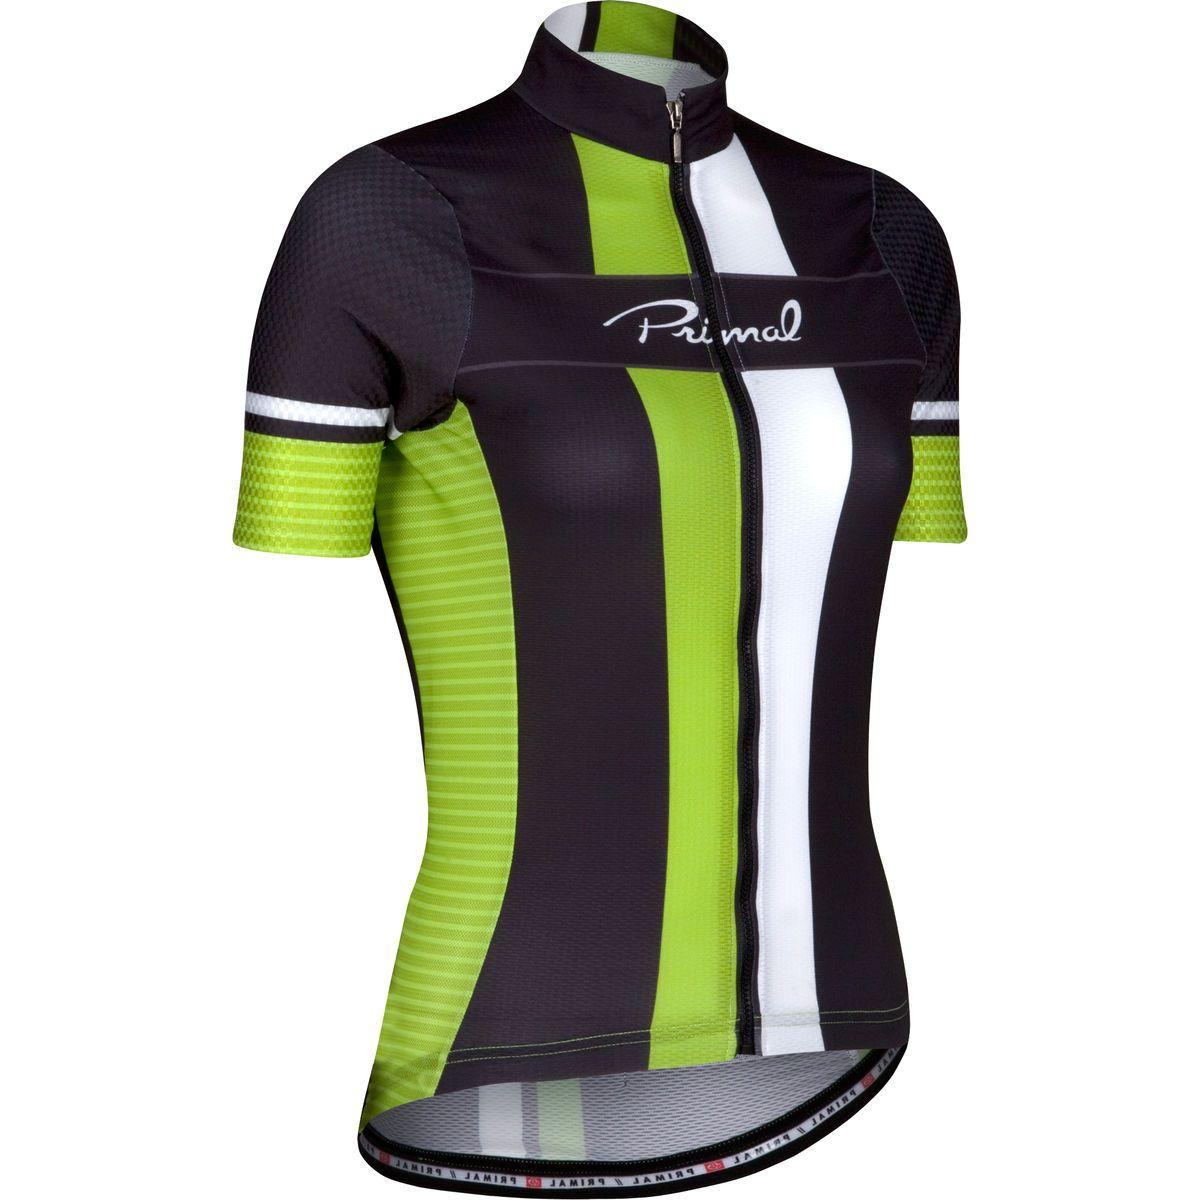 Primal Women s Exion Helix Jersey Short Sleeve Cycling Jerseys - istylesport 893d651d3